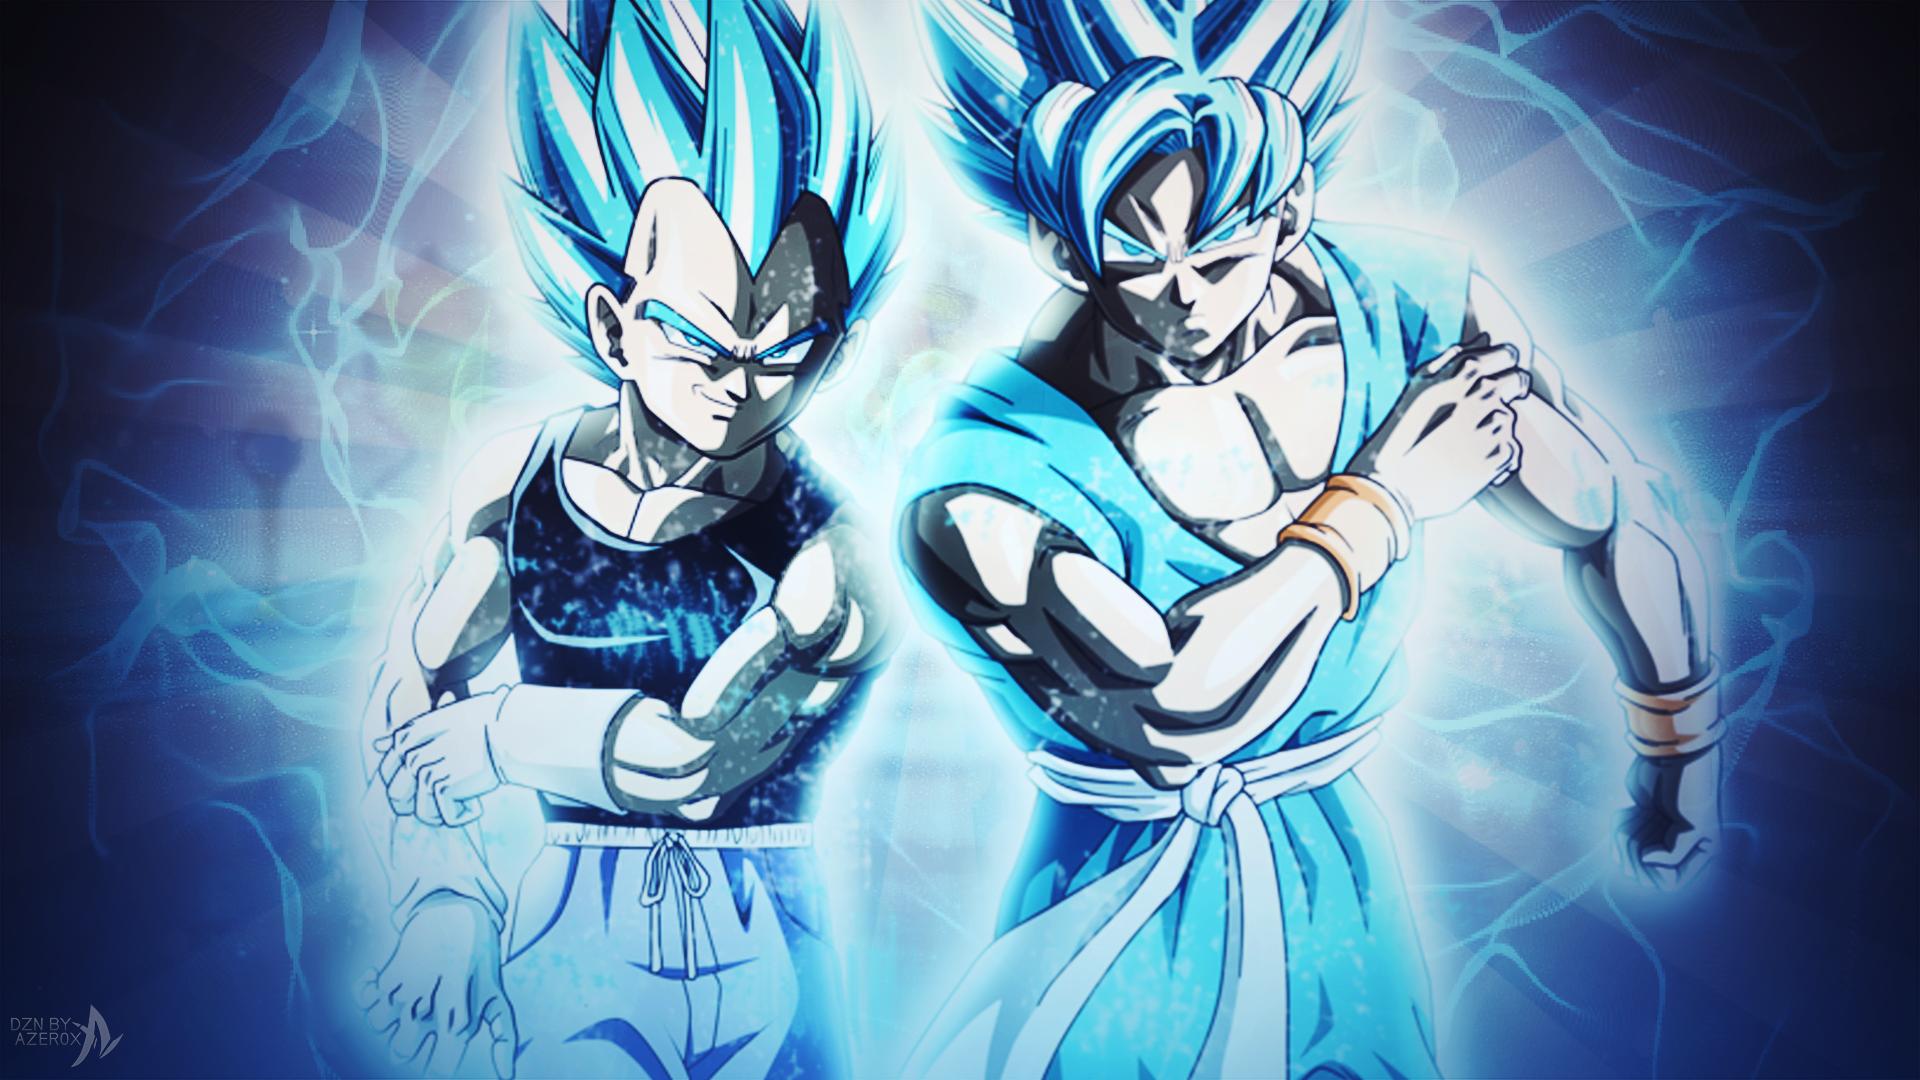 Goku And Vegeta Super Saiyan Blue End Of Z By Azer0xhd On